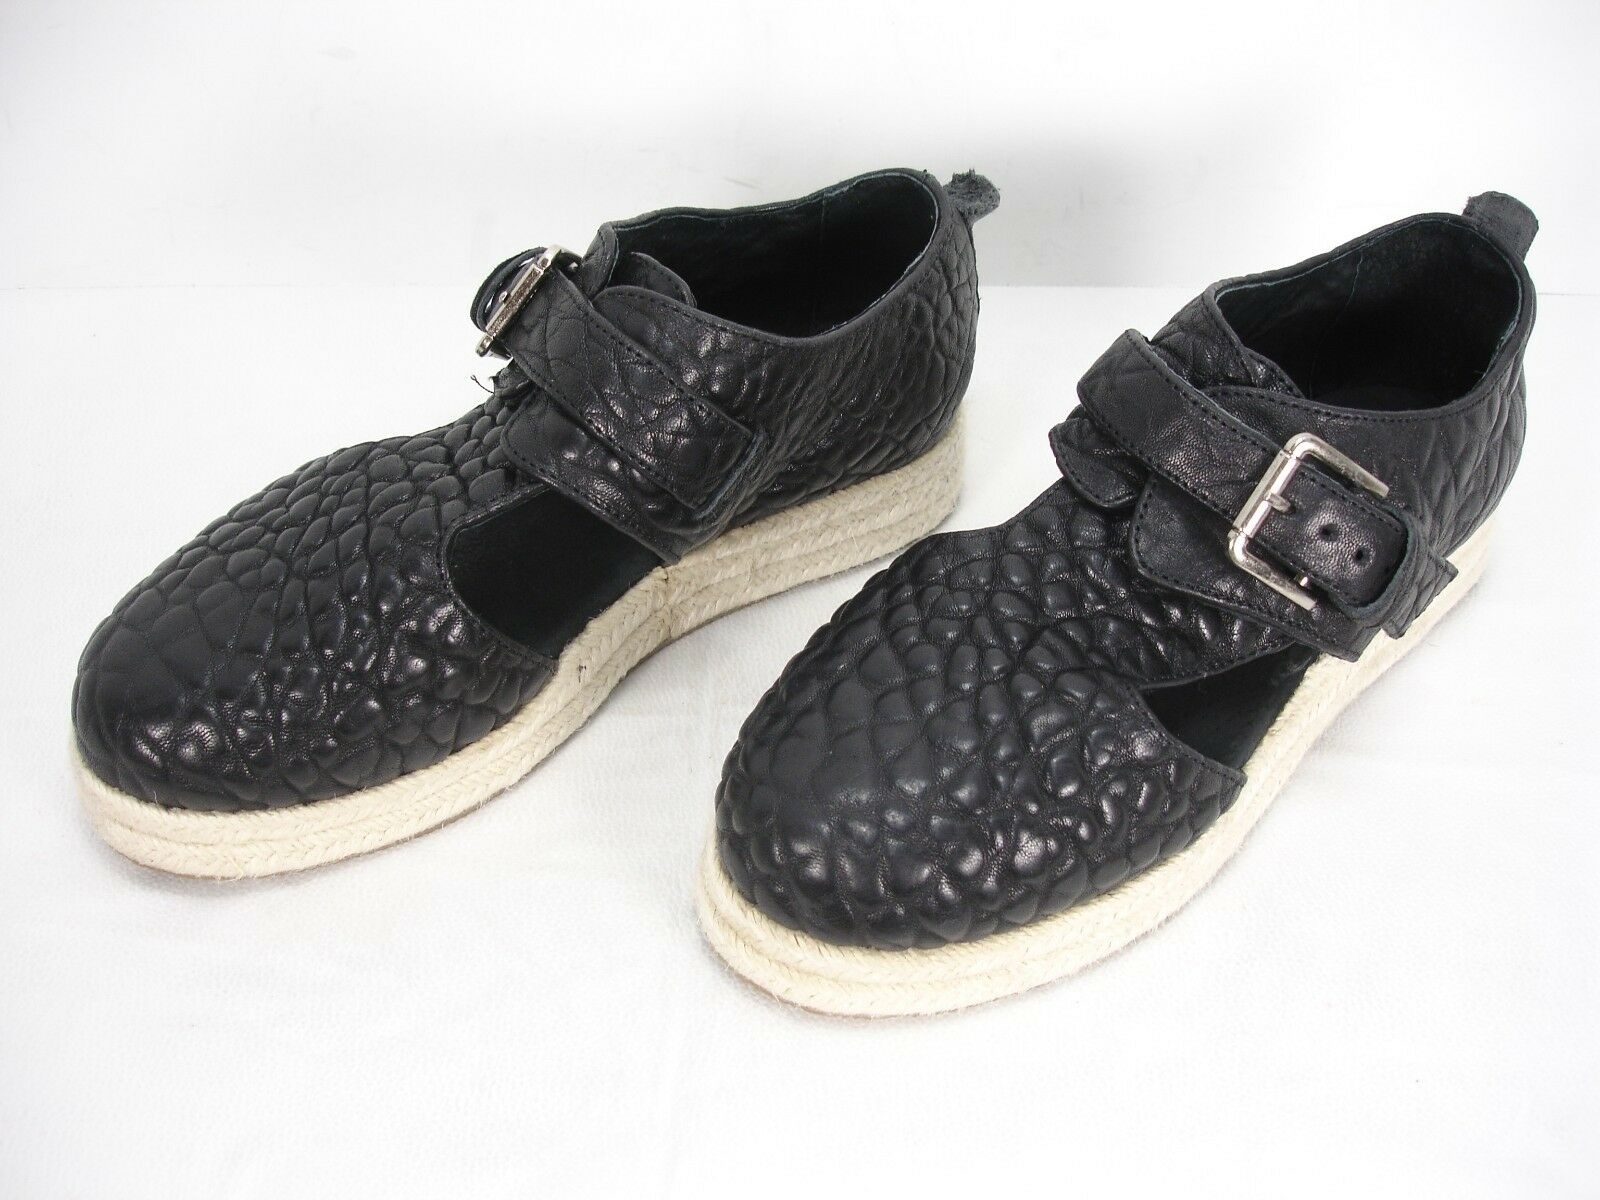 FREE PEOPLE BLACK LEATHER BIG PEBBLE BUCKLE STRAP ESPADRILLE Schuhe WOMEN'S 36